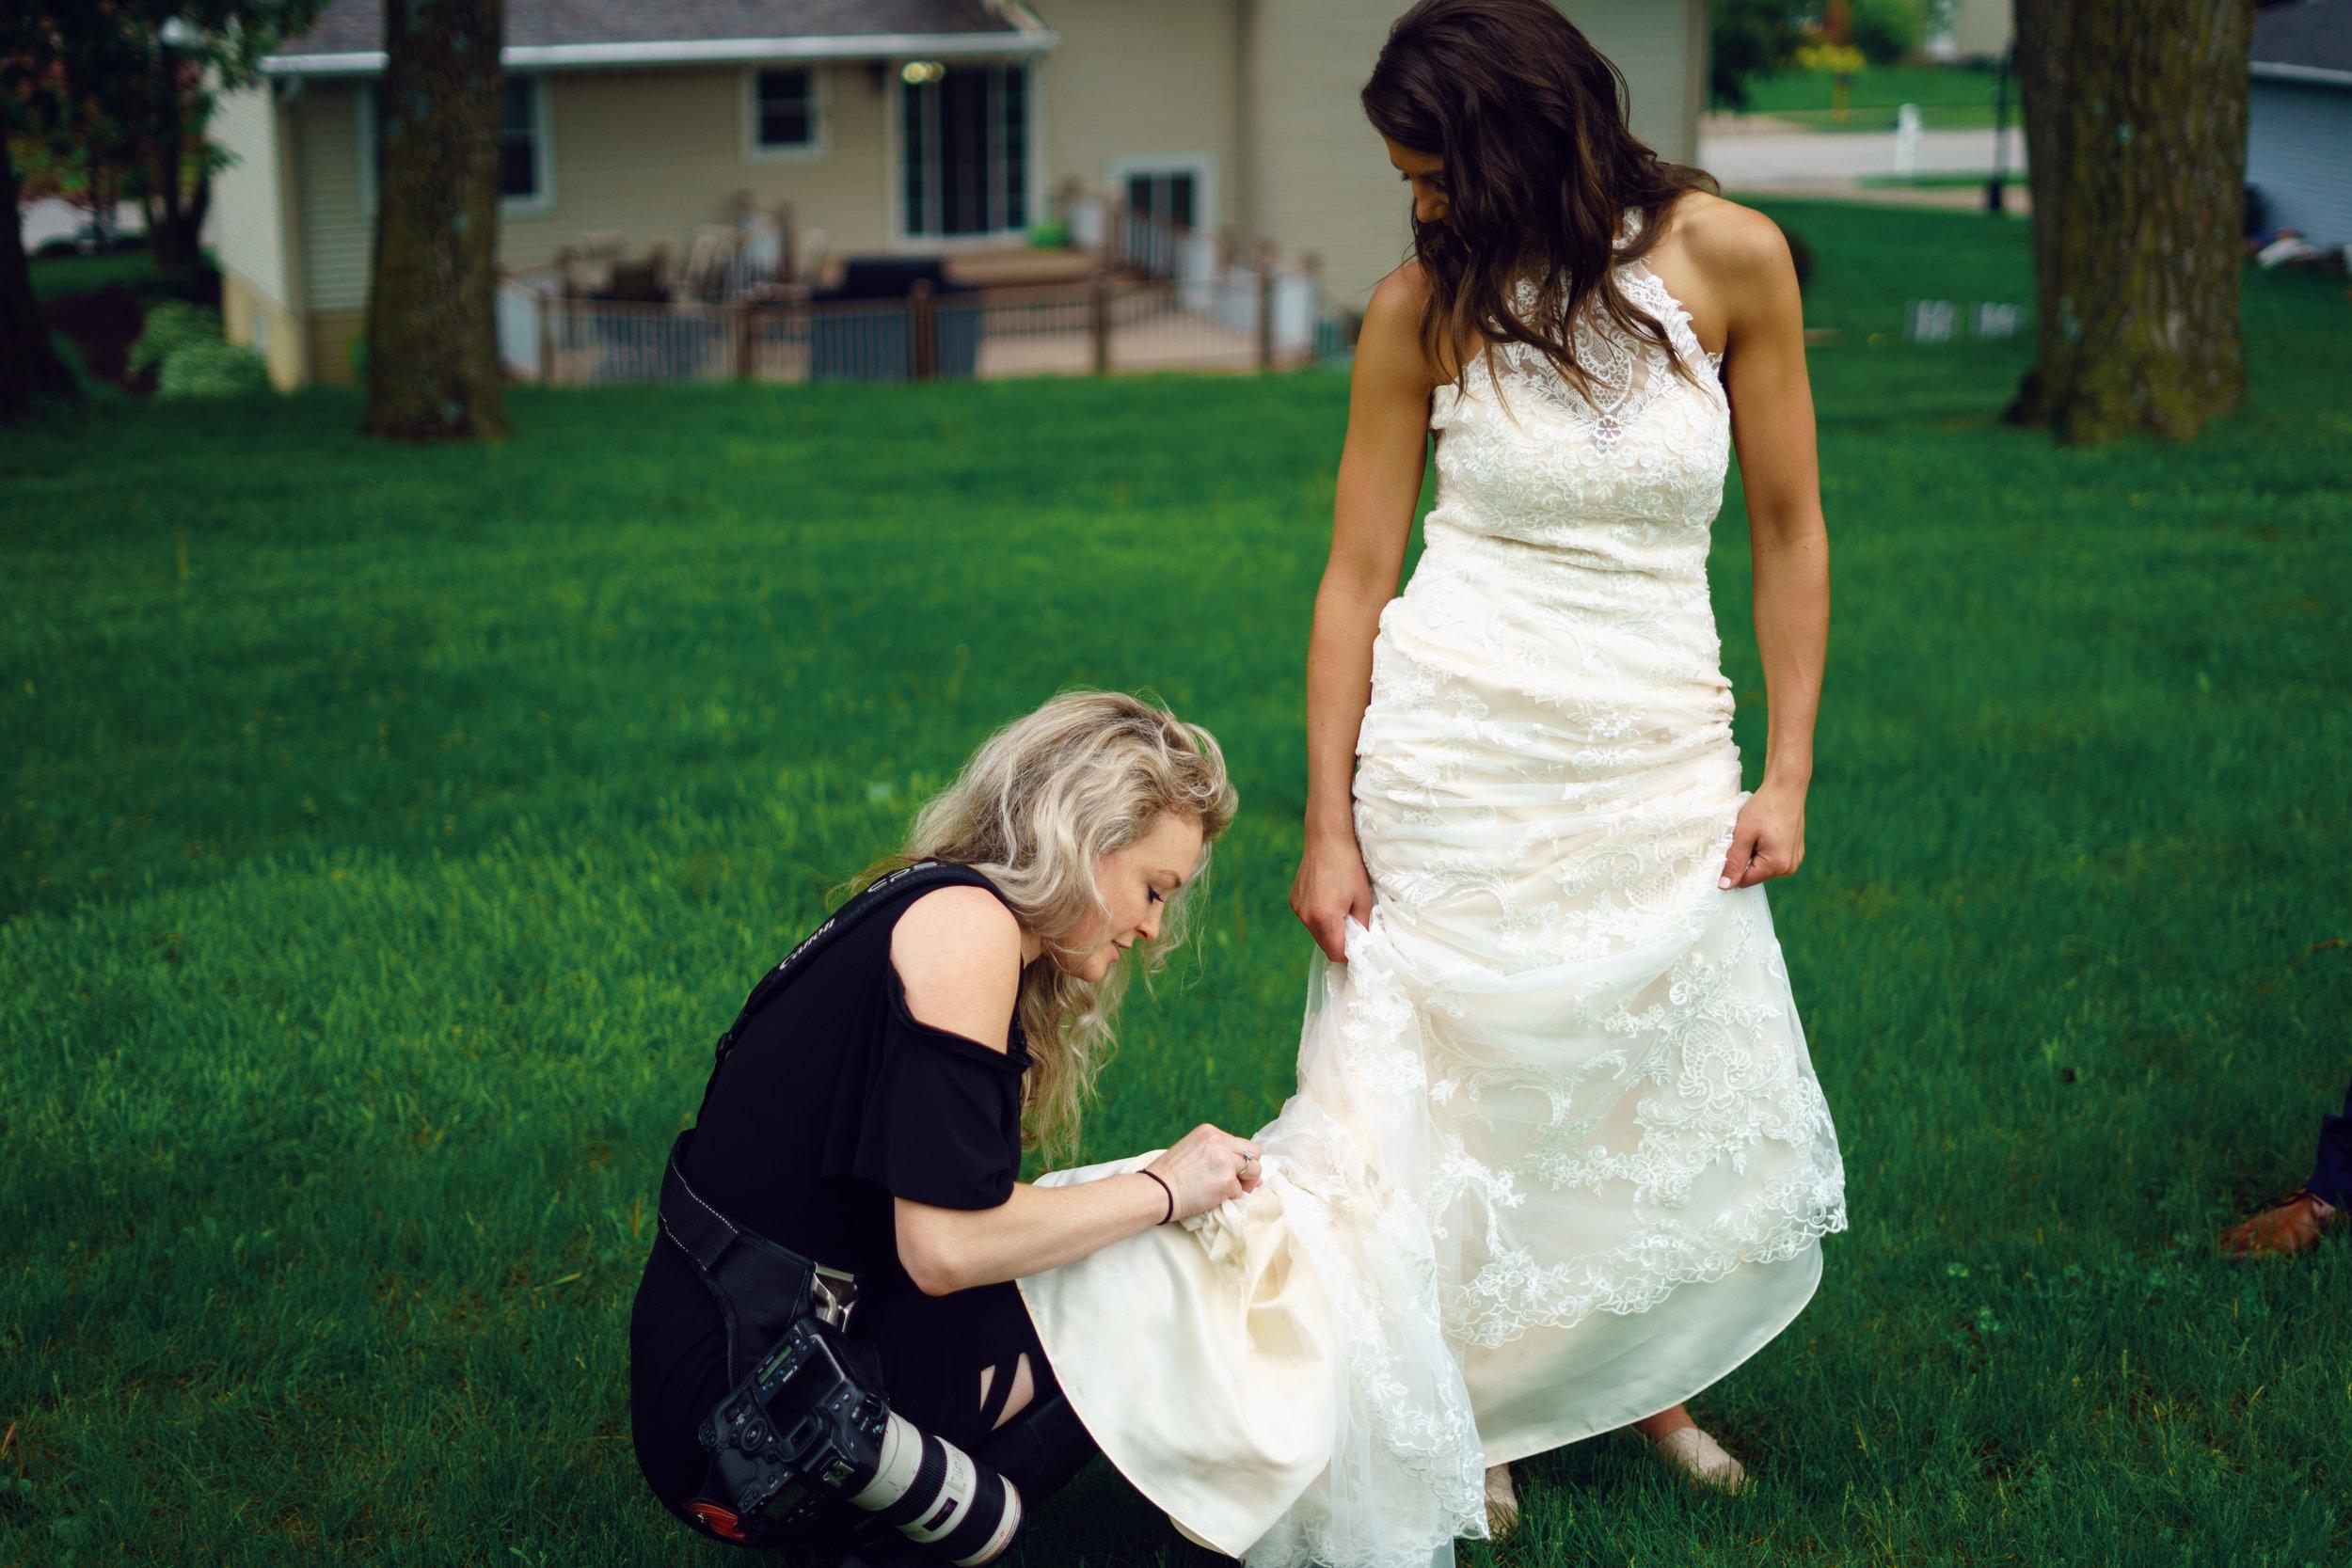 Lauren-ashley-photographer-cleaning-dress-2.jpg